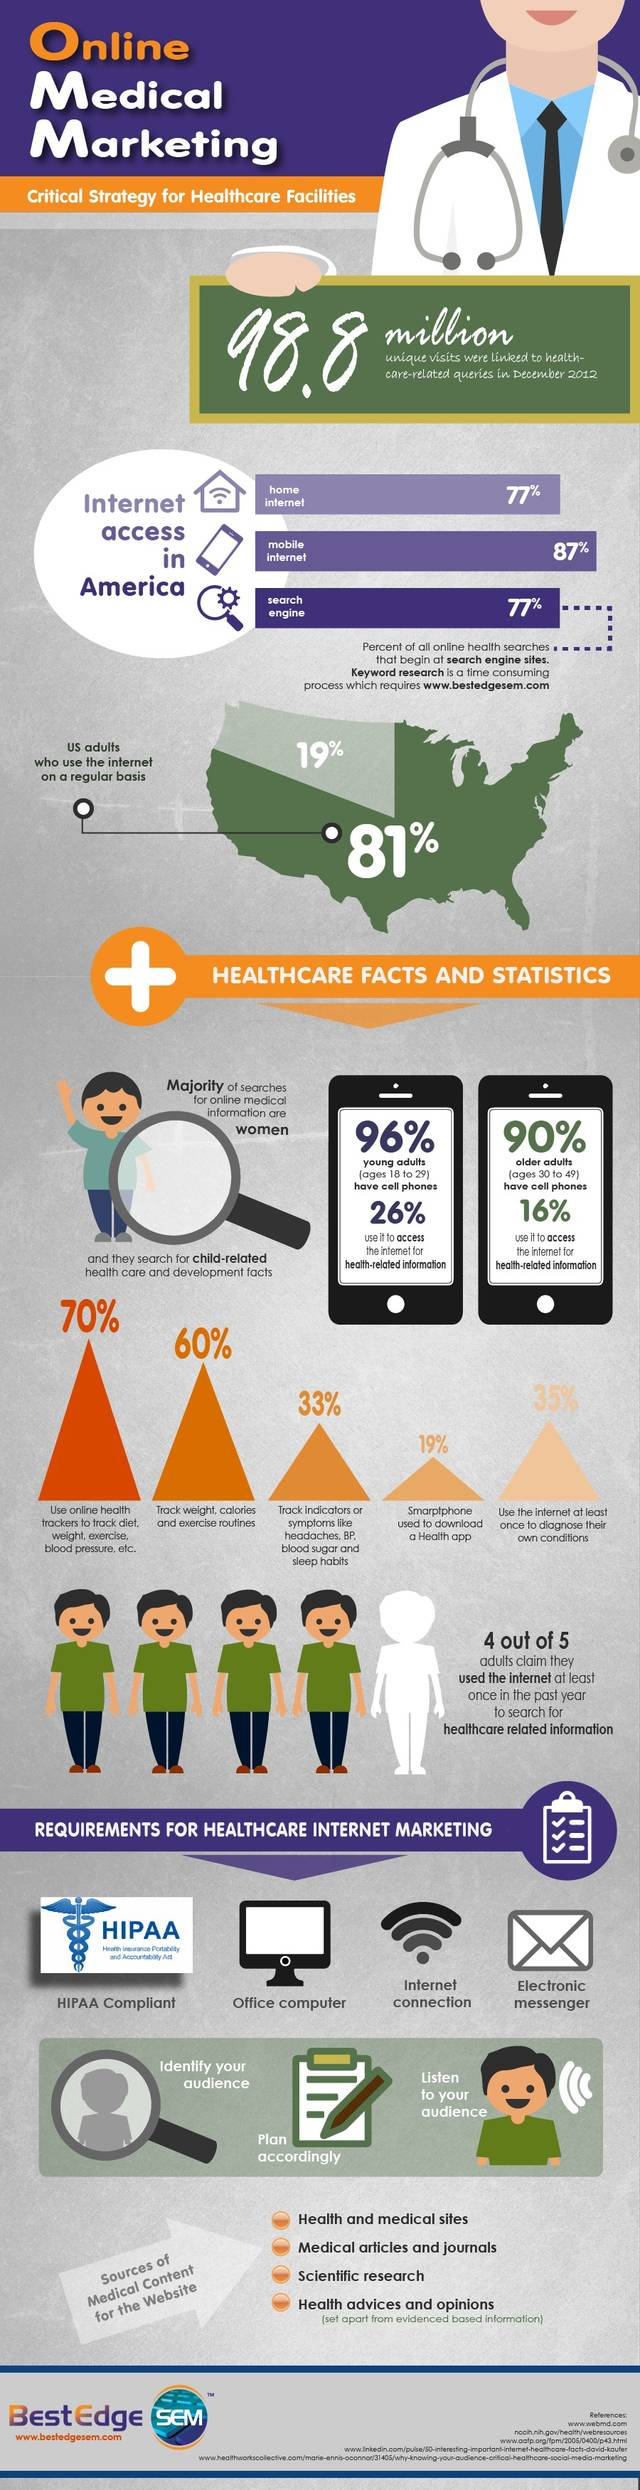 Online medical marketing strategies